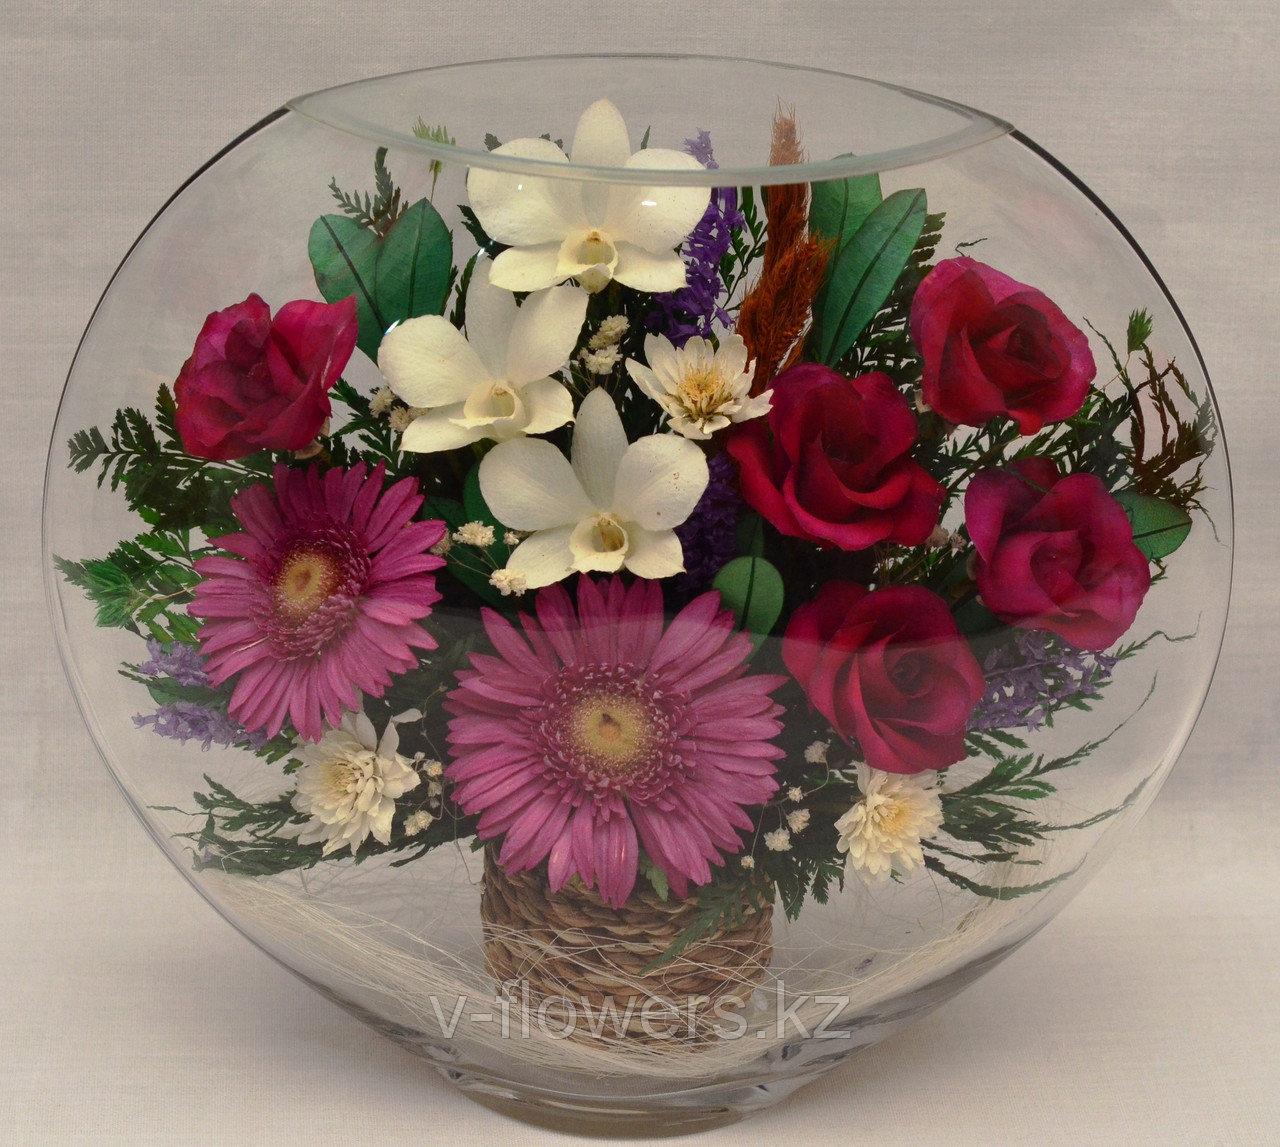 Цветы навсегда ELM-09